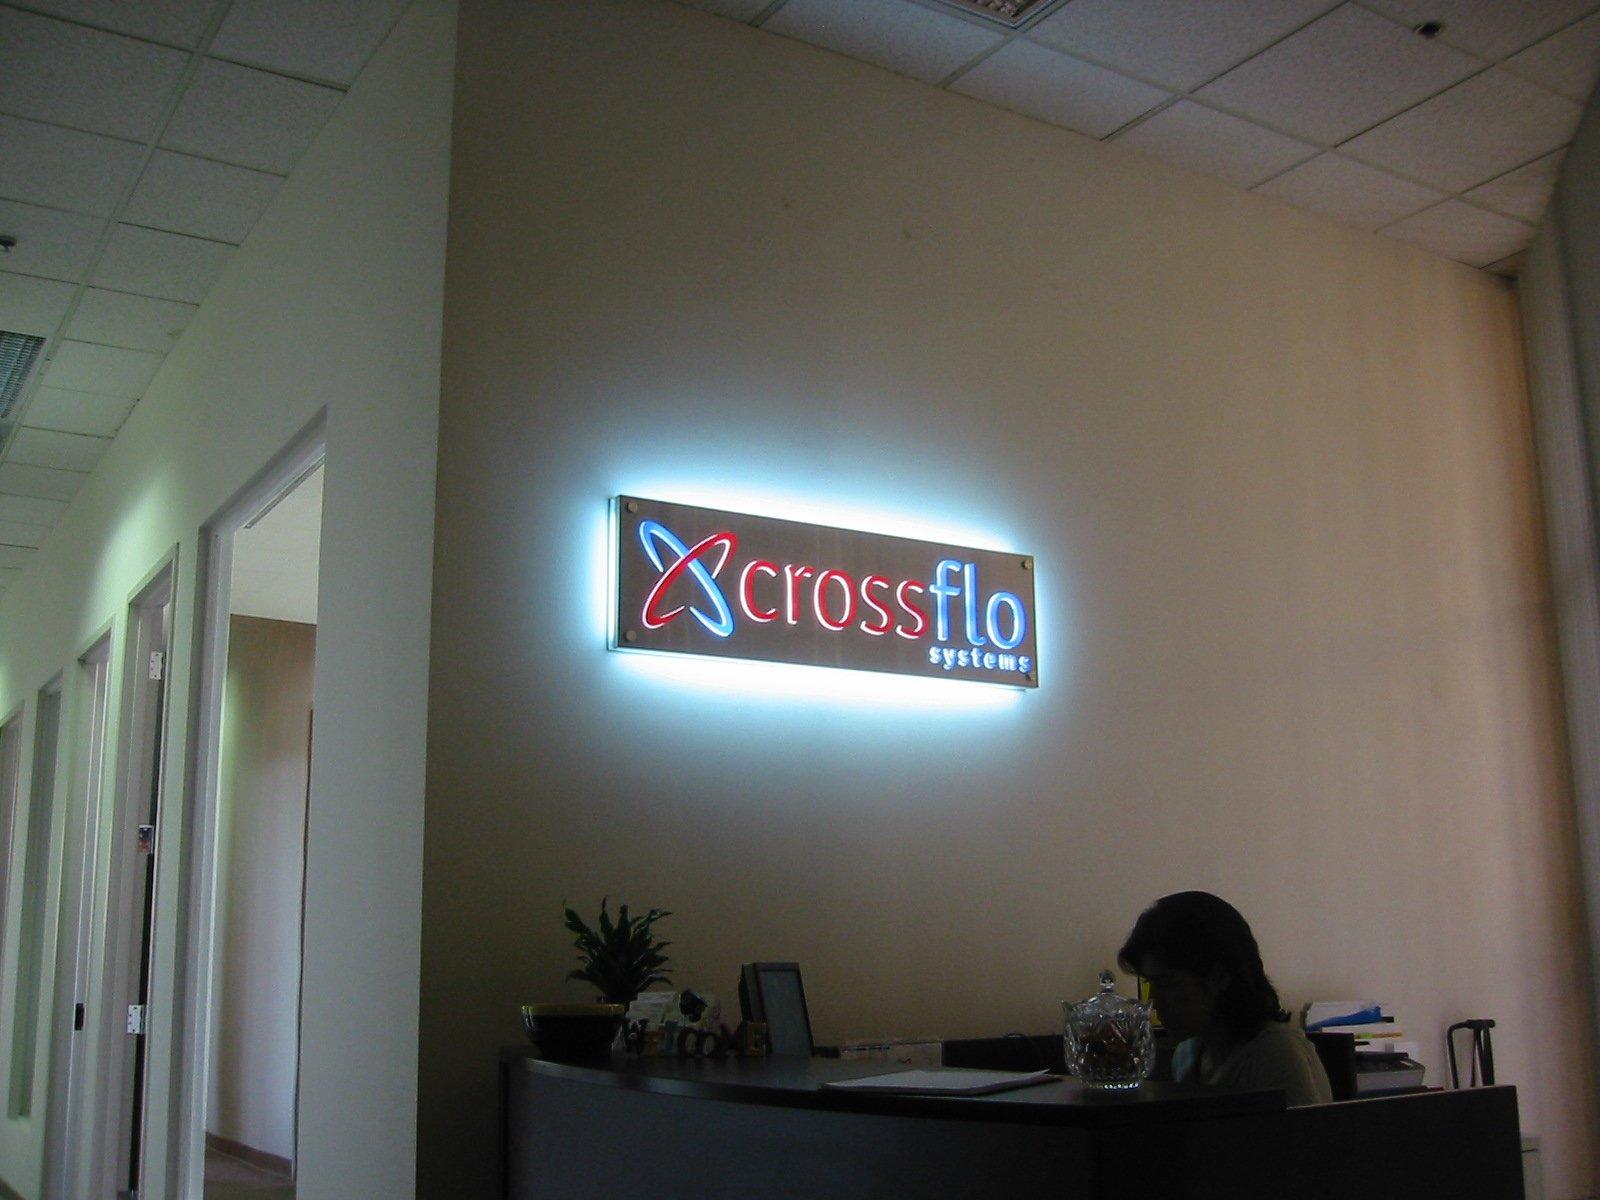 Crossflo Lobby Sign